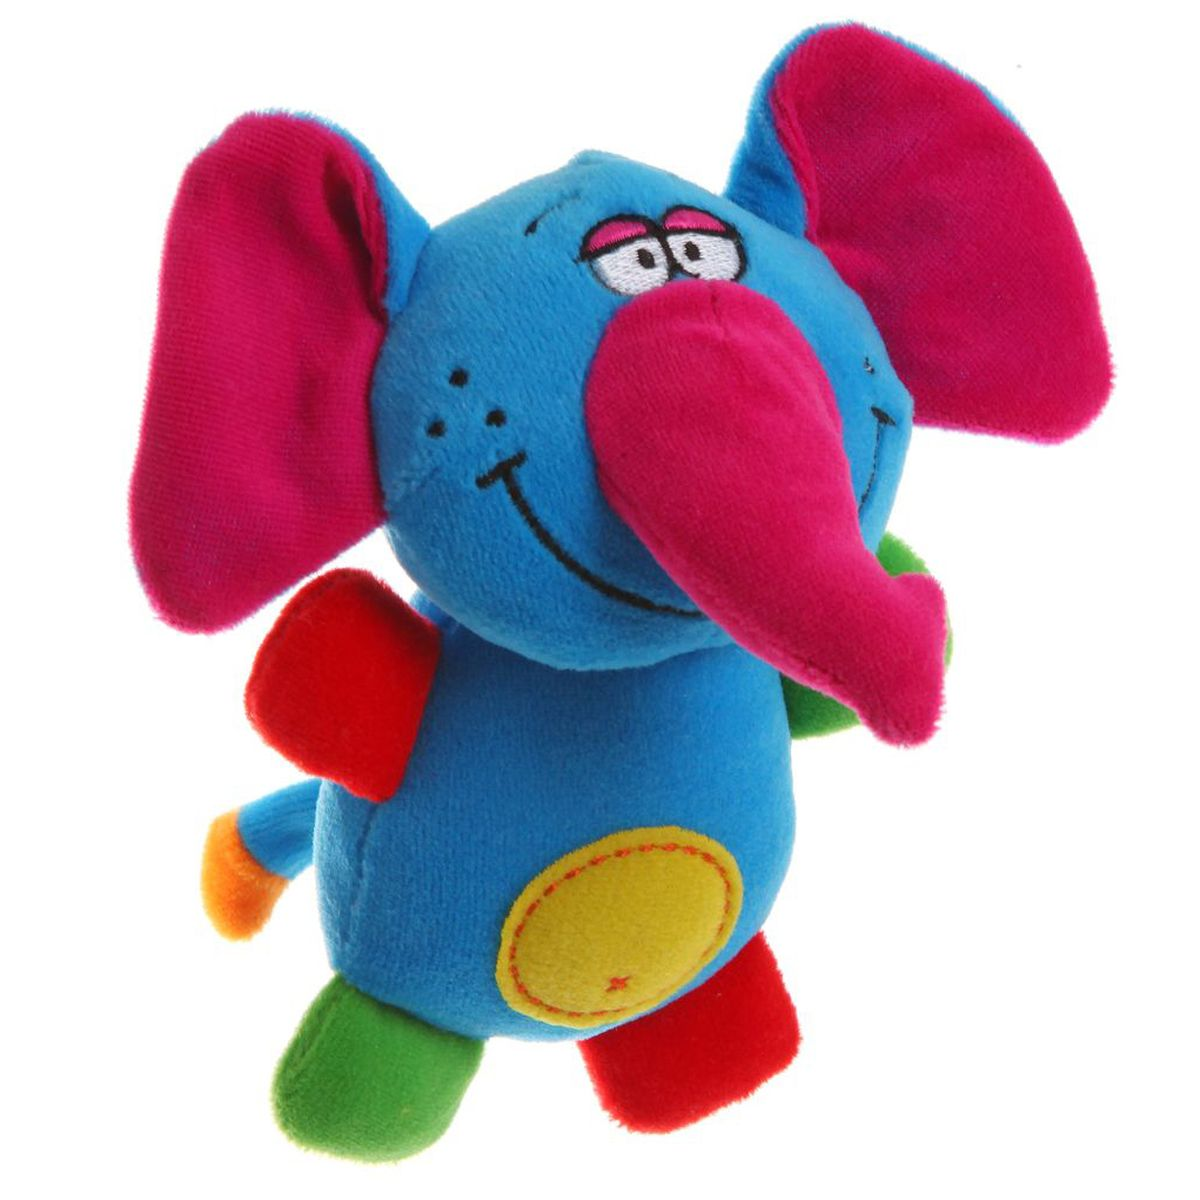 Bondibon Мягкая игрушка-погремушка Слон bondibon мягкая игрушка погремушка слоник